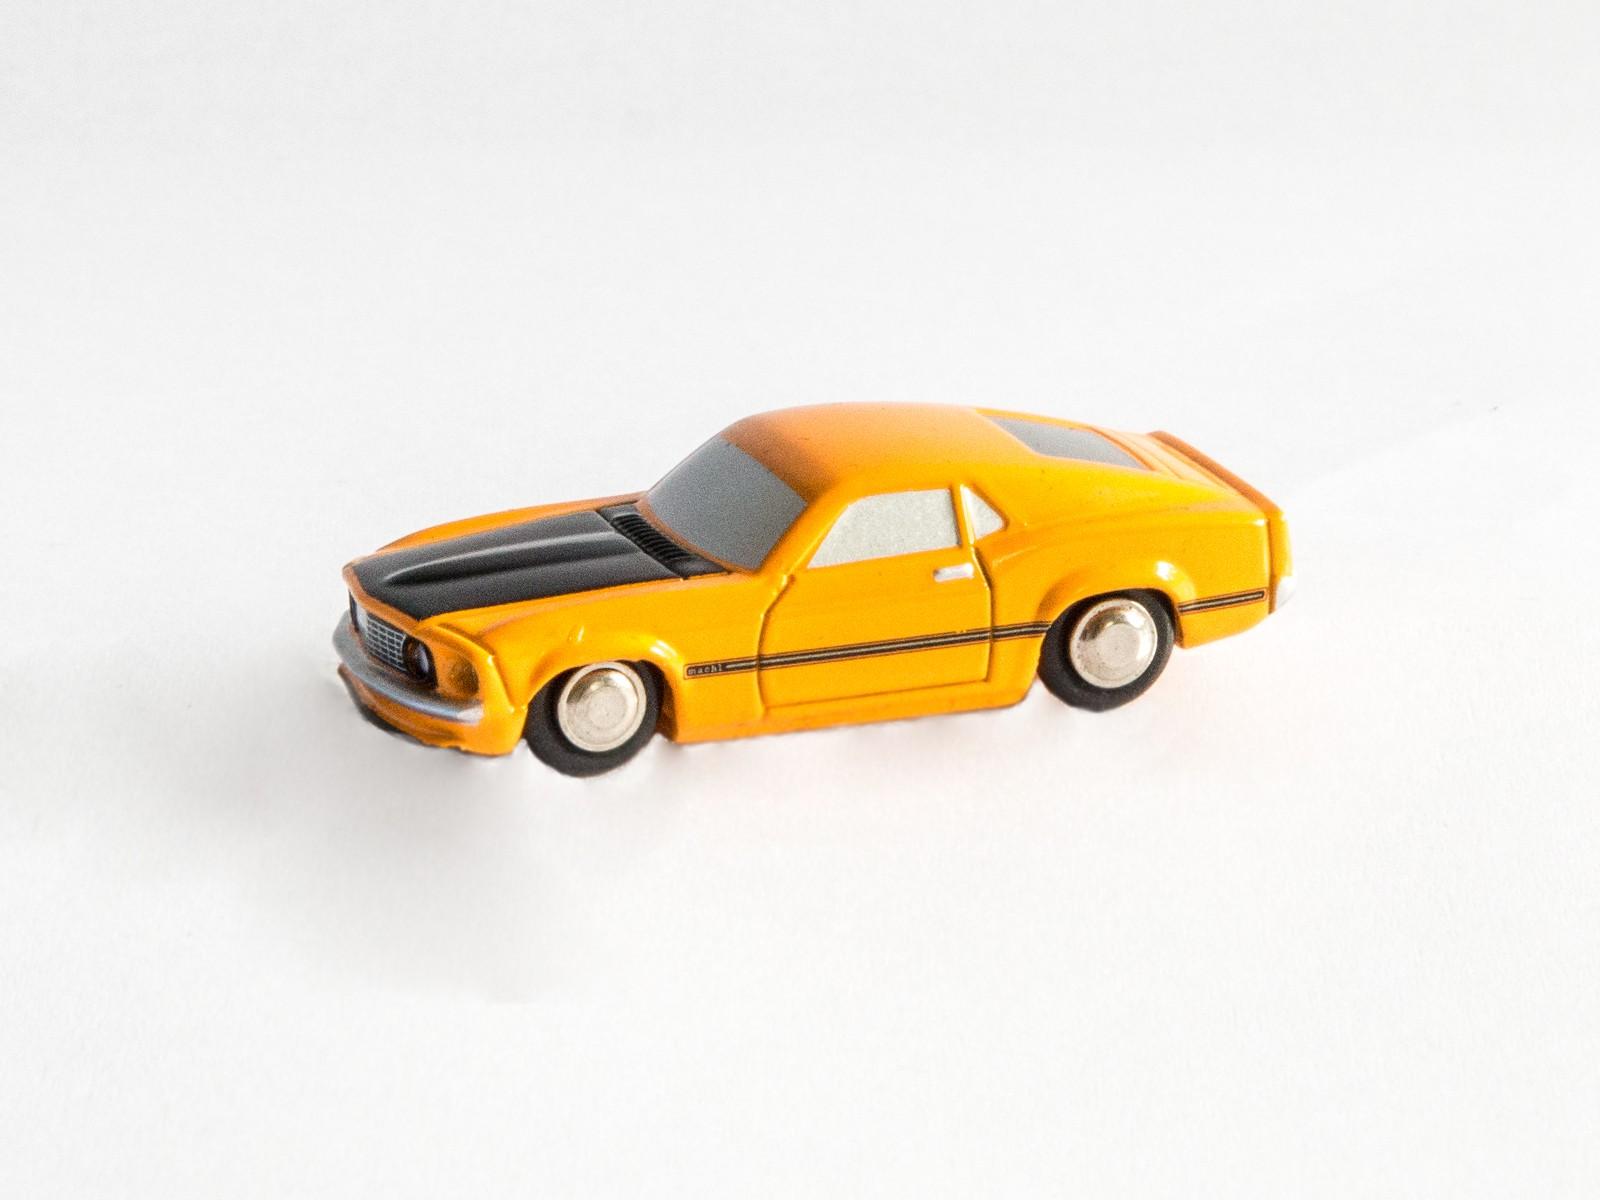 Schuco Piccolo 05833 Ford Mustang Mach 1